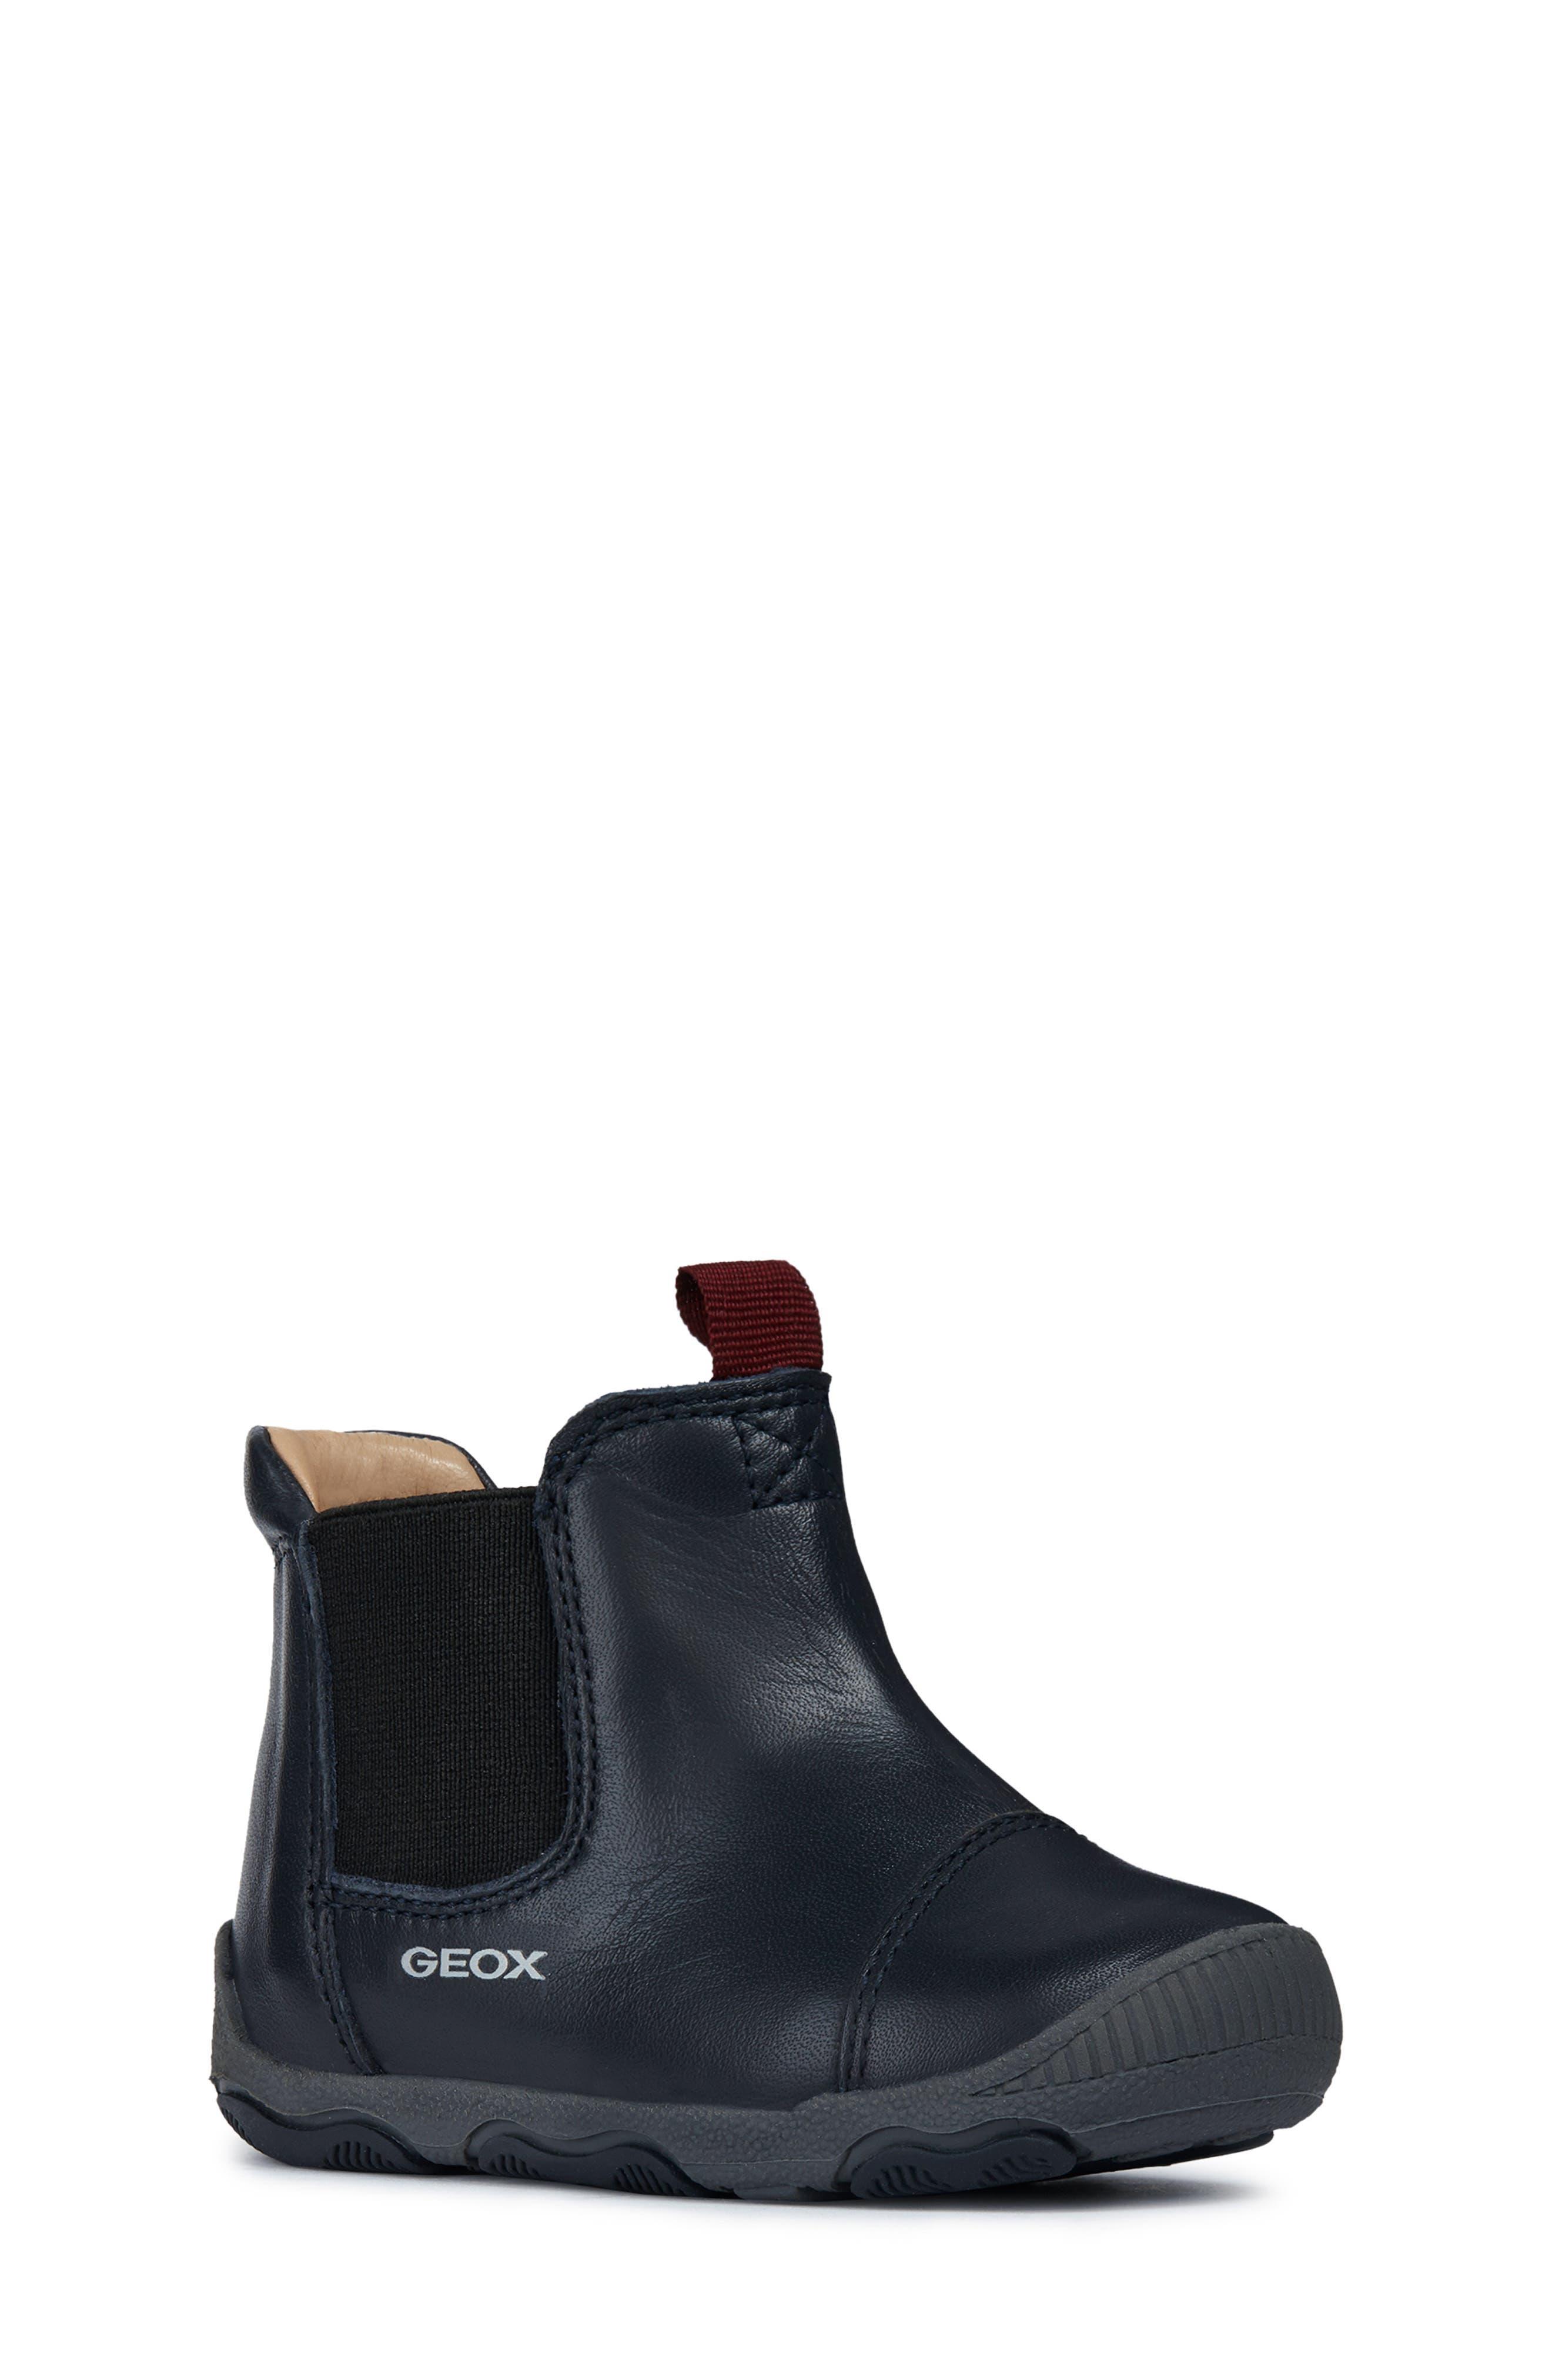 Balu Boot,                         Main,                         color, DARK NAVY